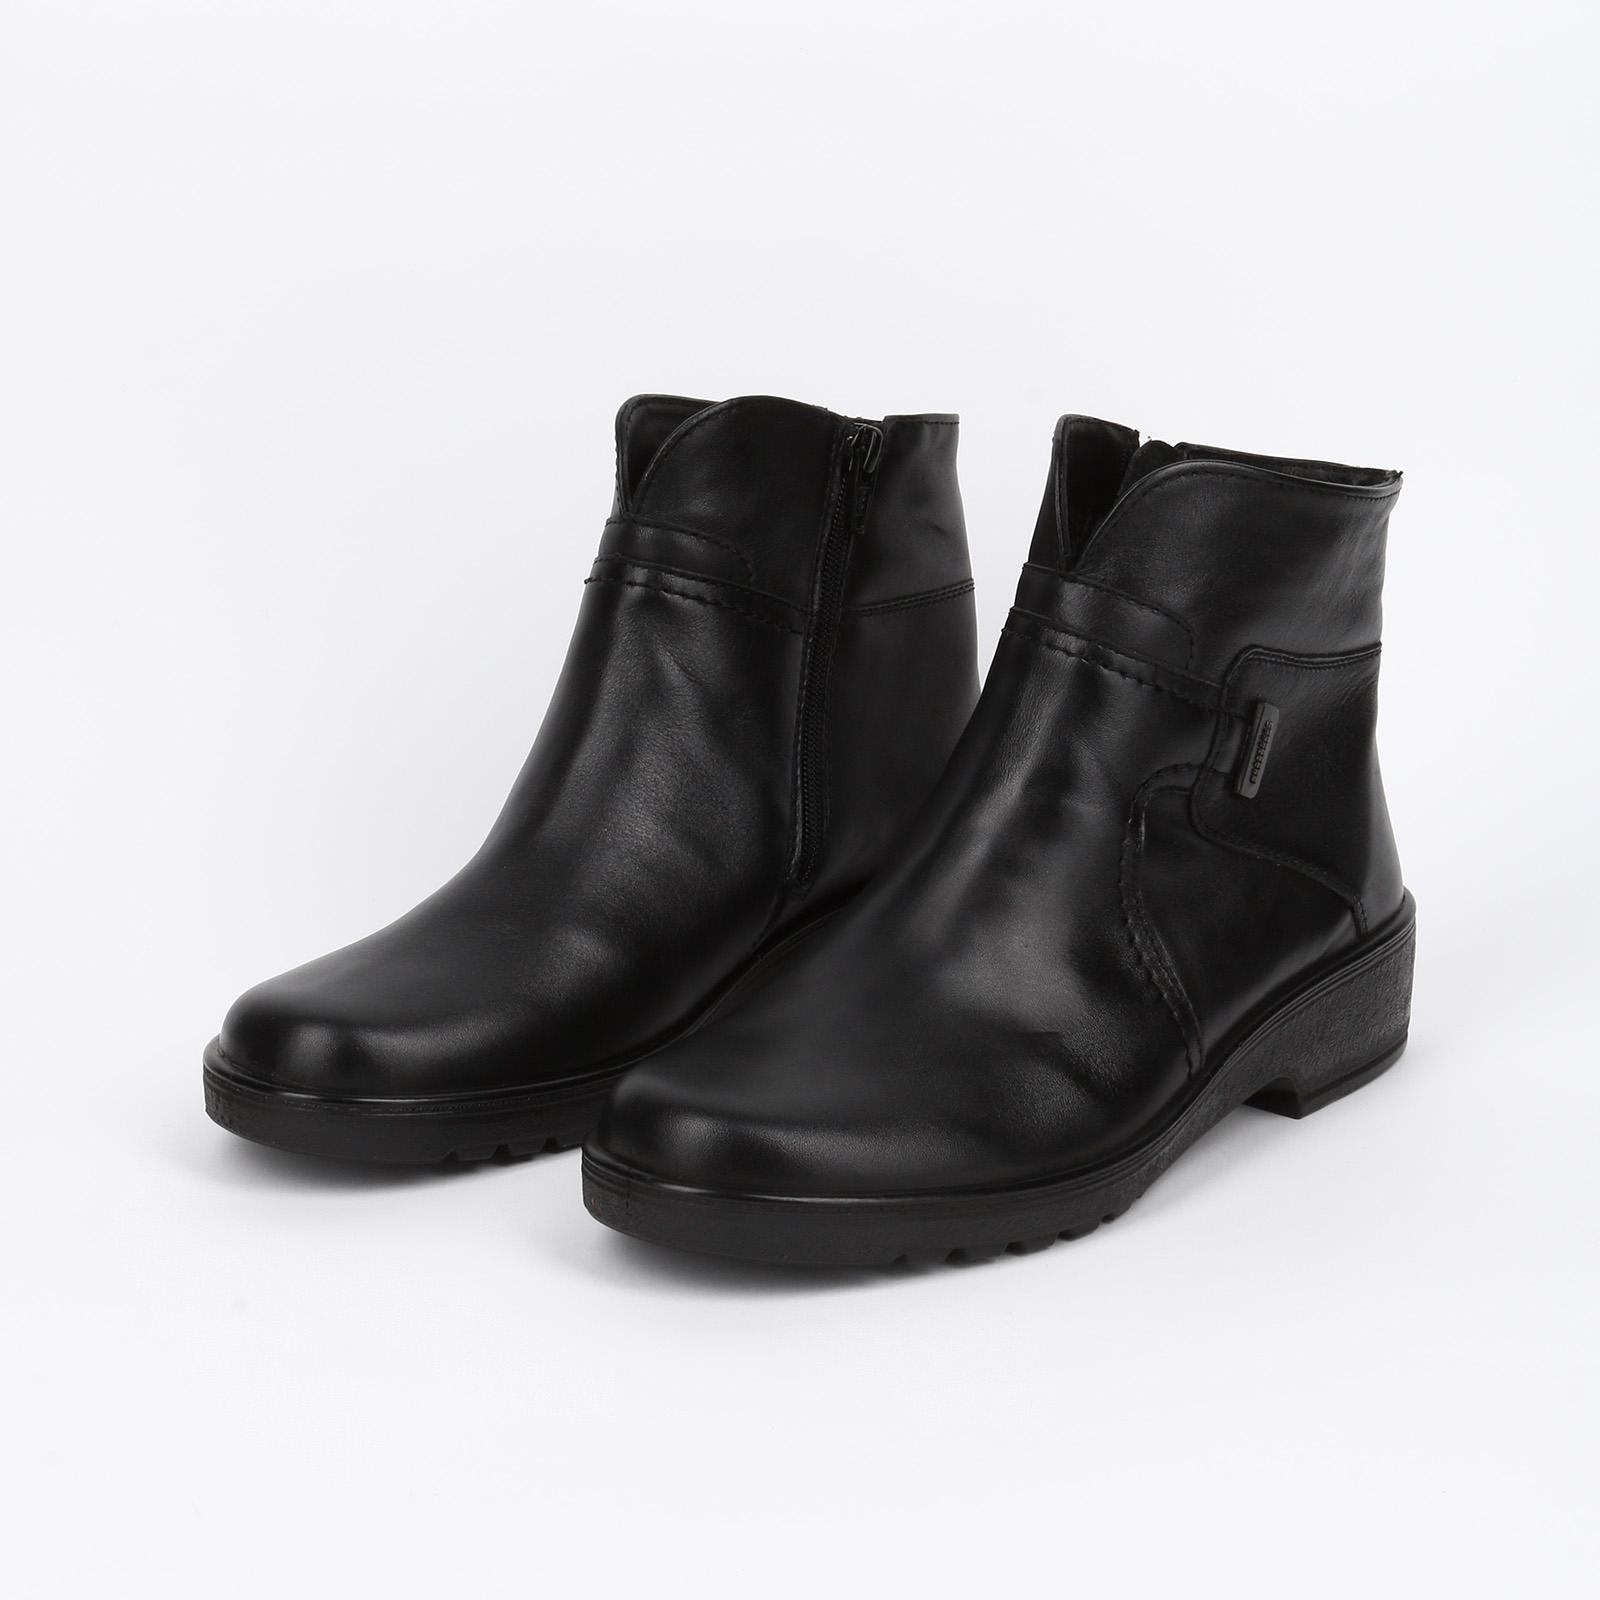 Ботинки женские на молнии